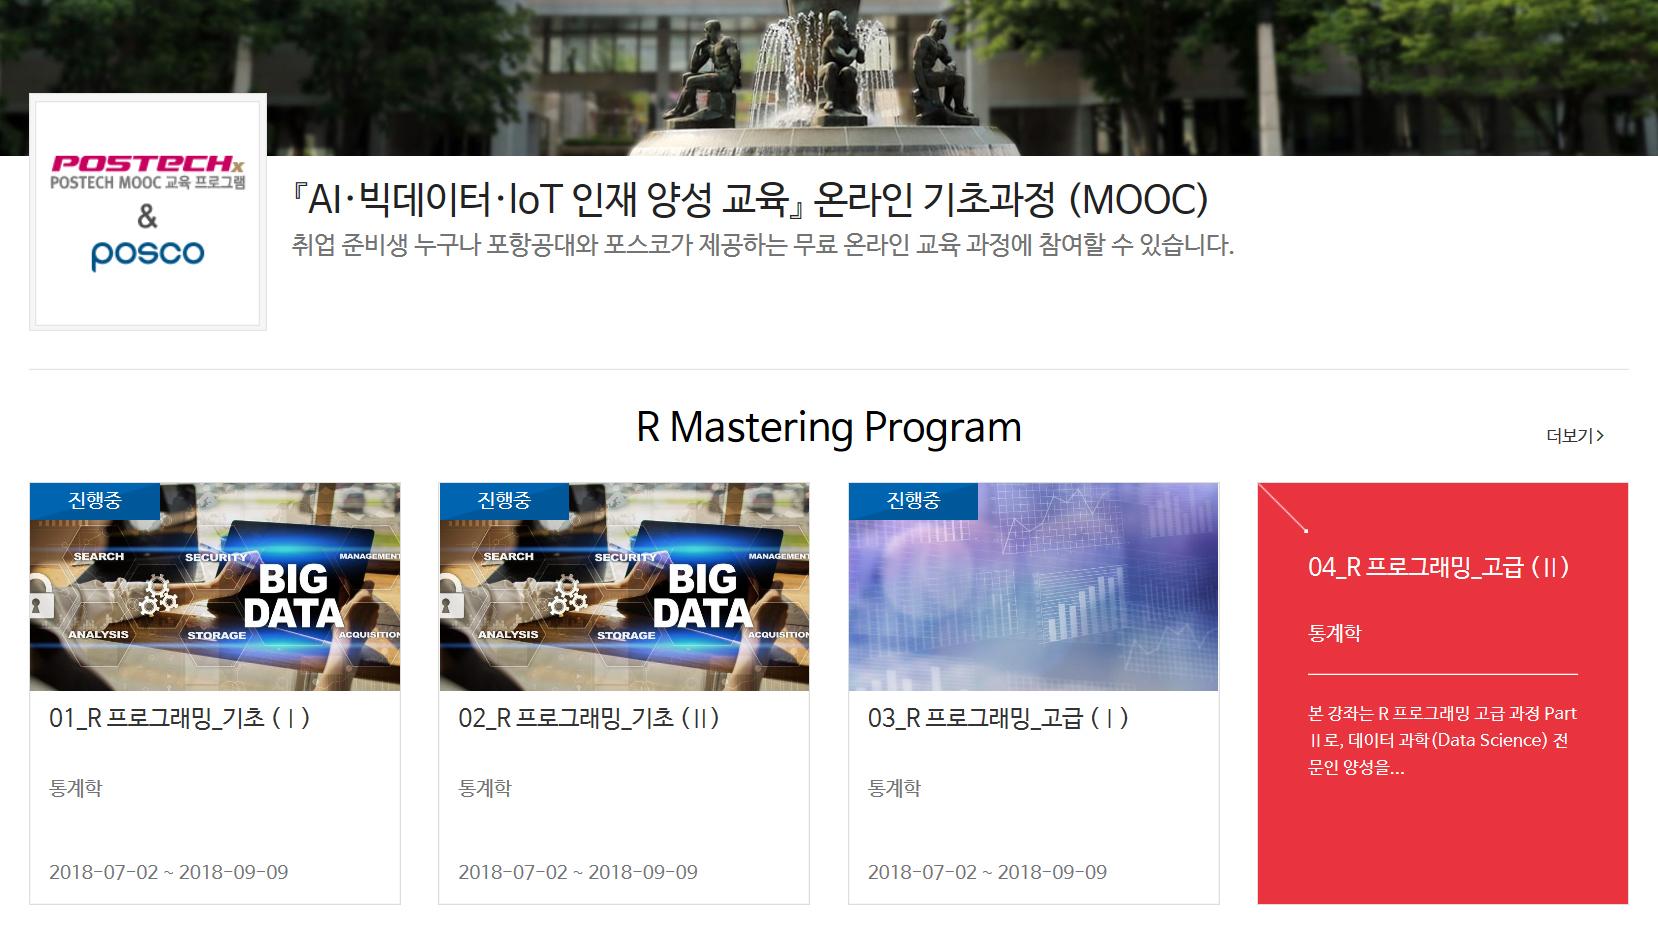 POSTECHx postech MOOC 교육 프로그램 & posco『AI·빅데이터· IoT 인재양성 교육』 온라인 기초과정(MOOC) 취업 준비생 누구나 포항공대와 포스코가 제공하는 무료 온라인 교육 과정에 참여할 수 있습니다. R Mastering Program 01_R 프로그래밍_기초 (Ⅰ)통계학 02_R 프로그래밍_기초(Ⅱ) 통계학 03_R 프로그래밍_고급(Ⅰ) 통계학 04_R 프로그래밍_고급(Ⅱ) 통계학 본 강좌는 R프로그래밍 고급 과정 Part Ⅱ로, 데이터 과학(Data Science) 전문인 양성을 ....